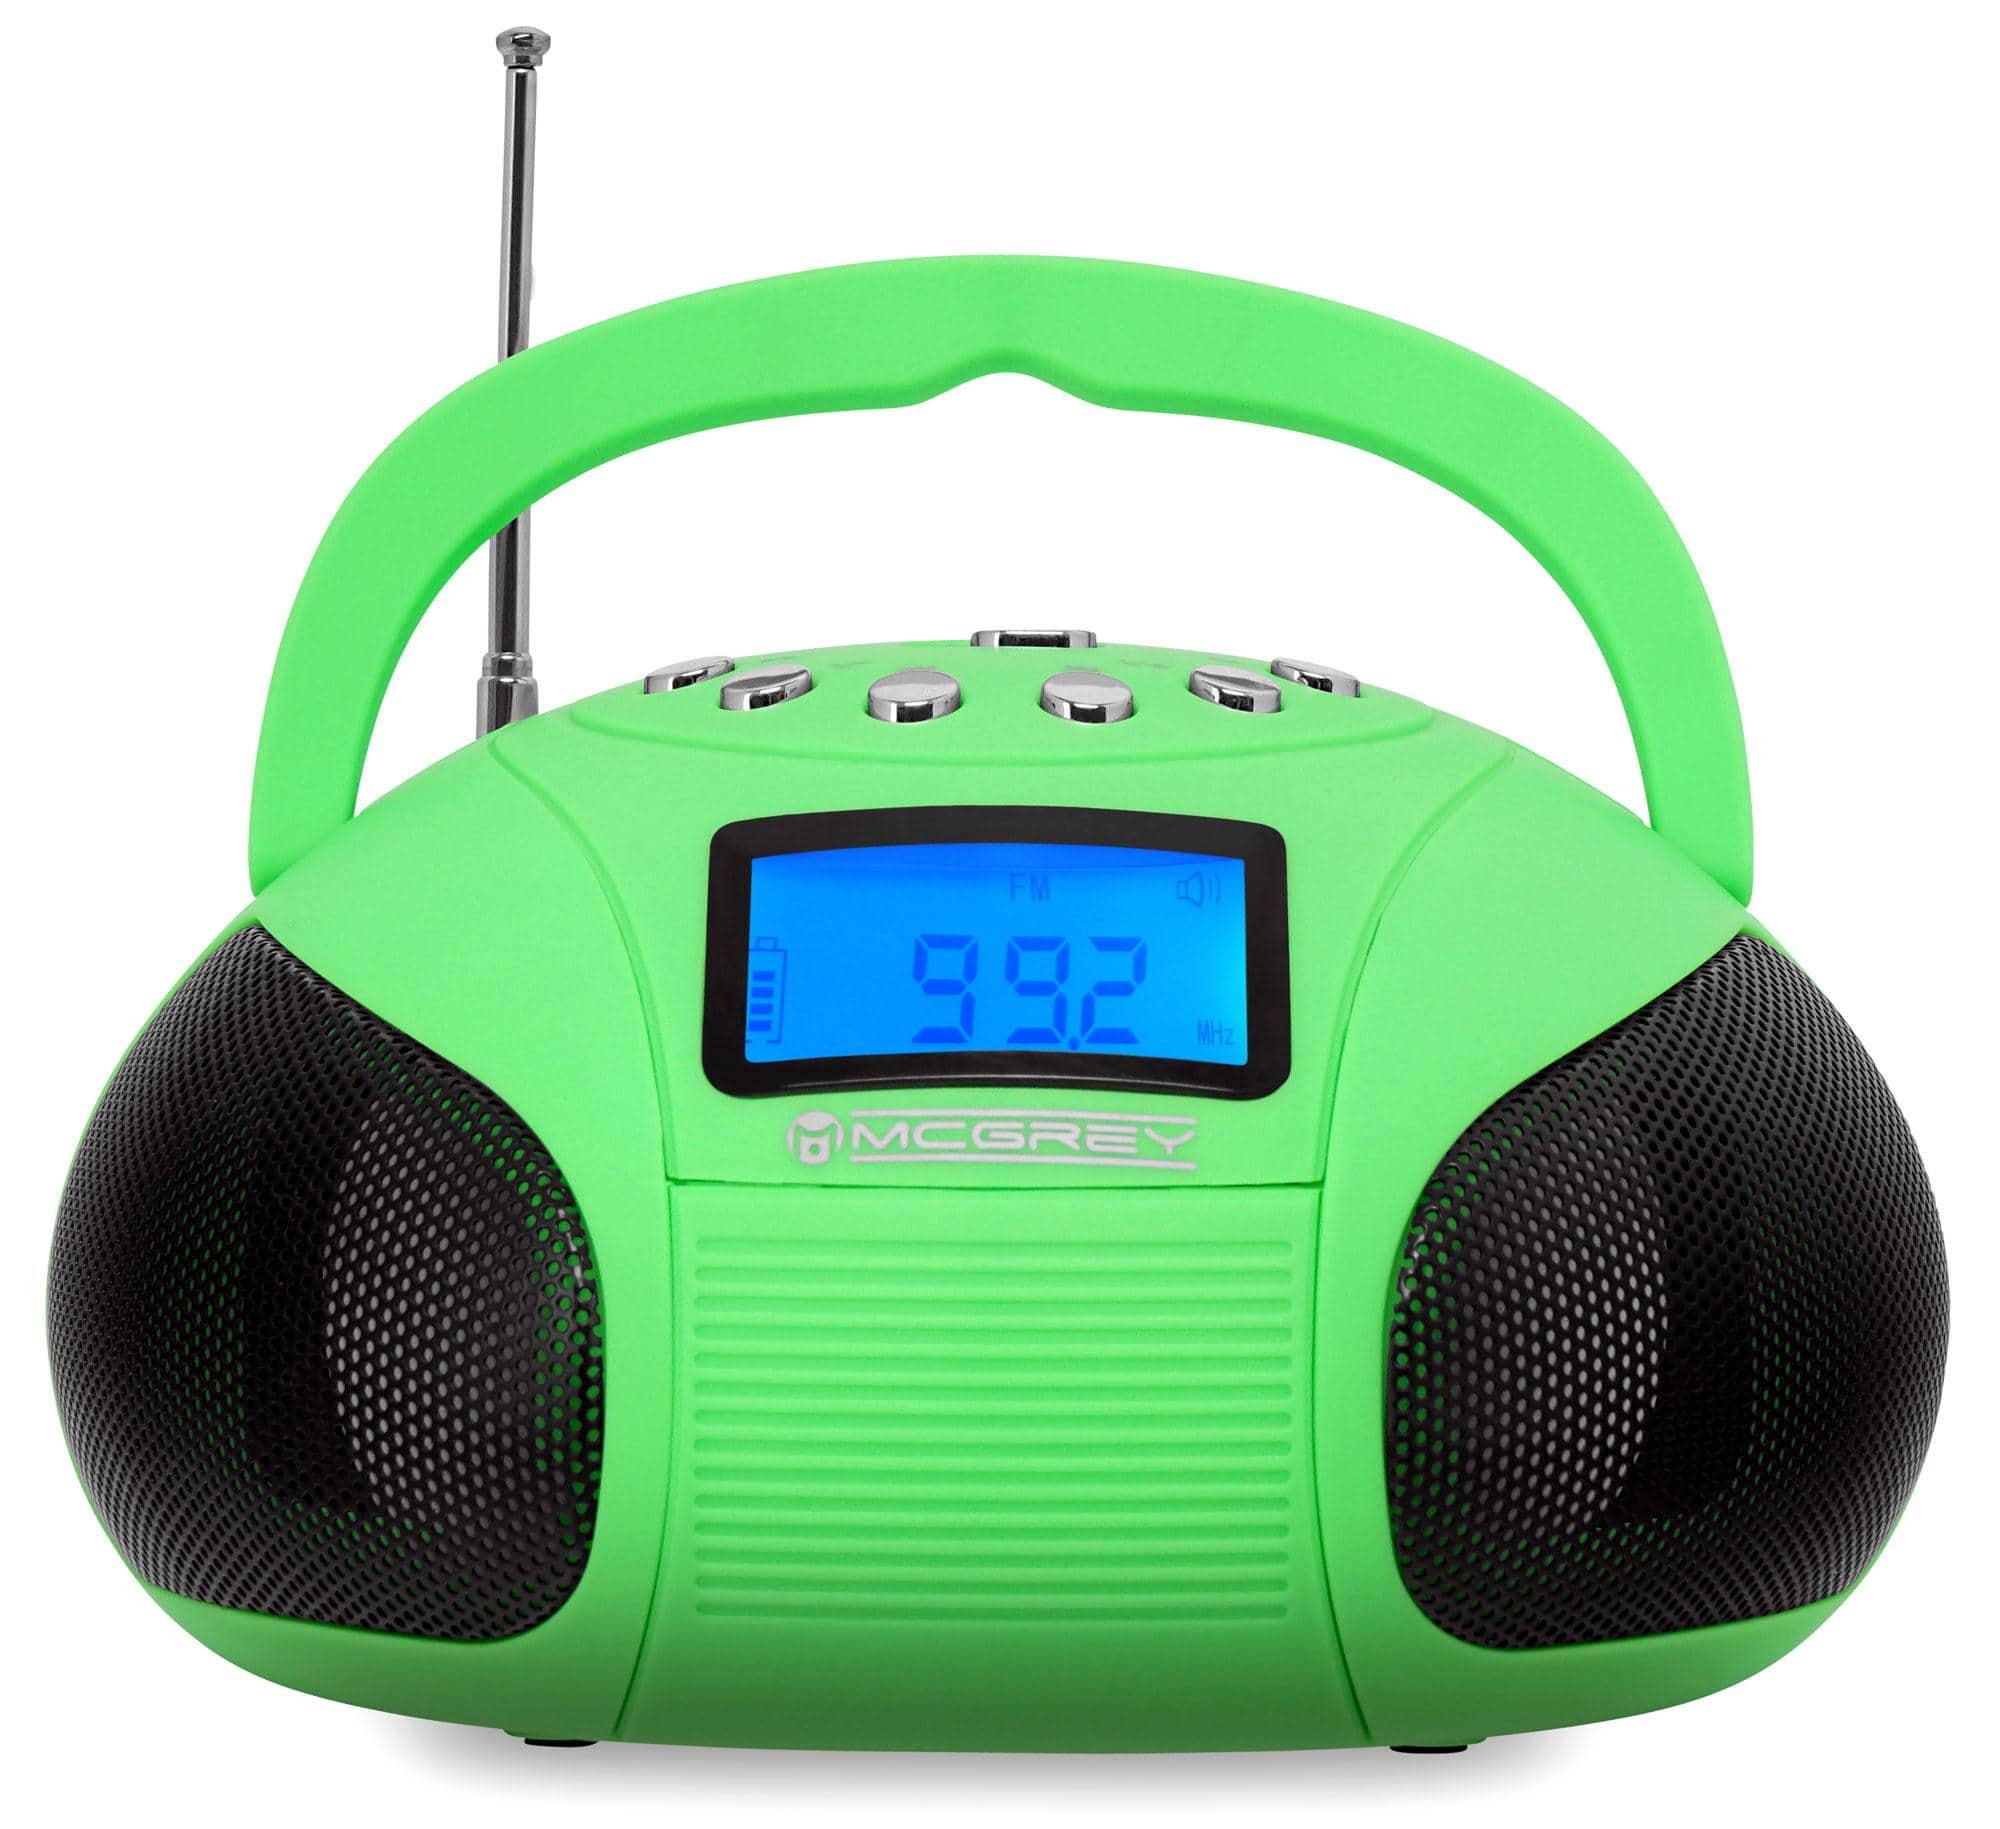 bose radio alarm clock manual